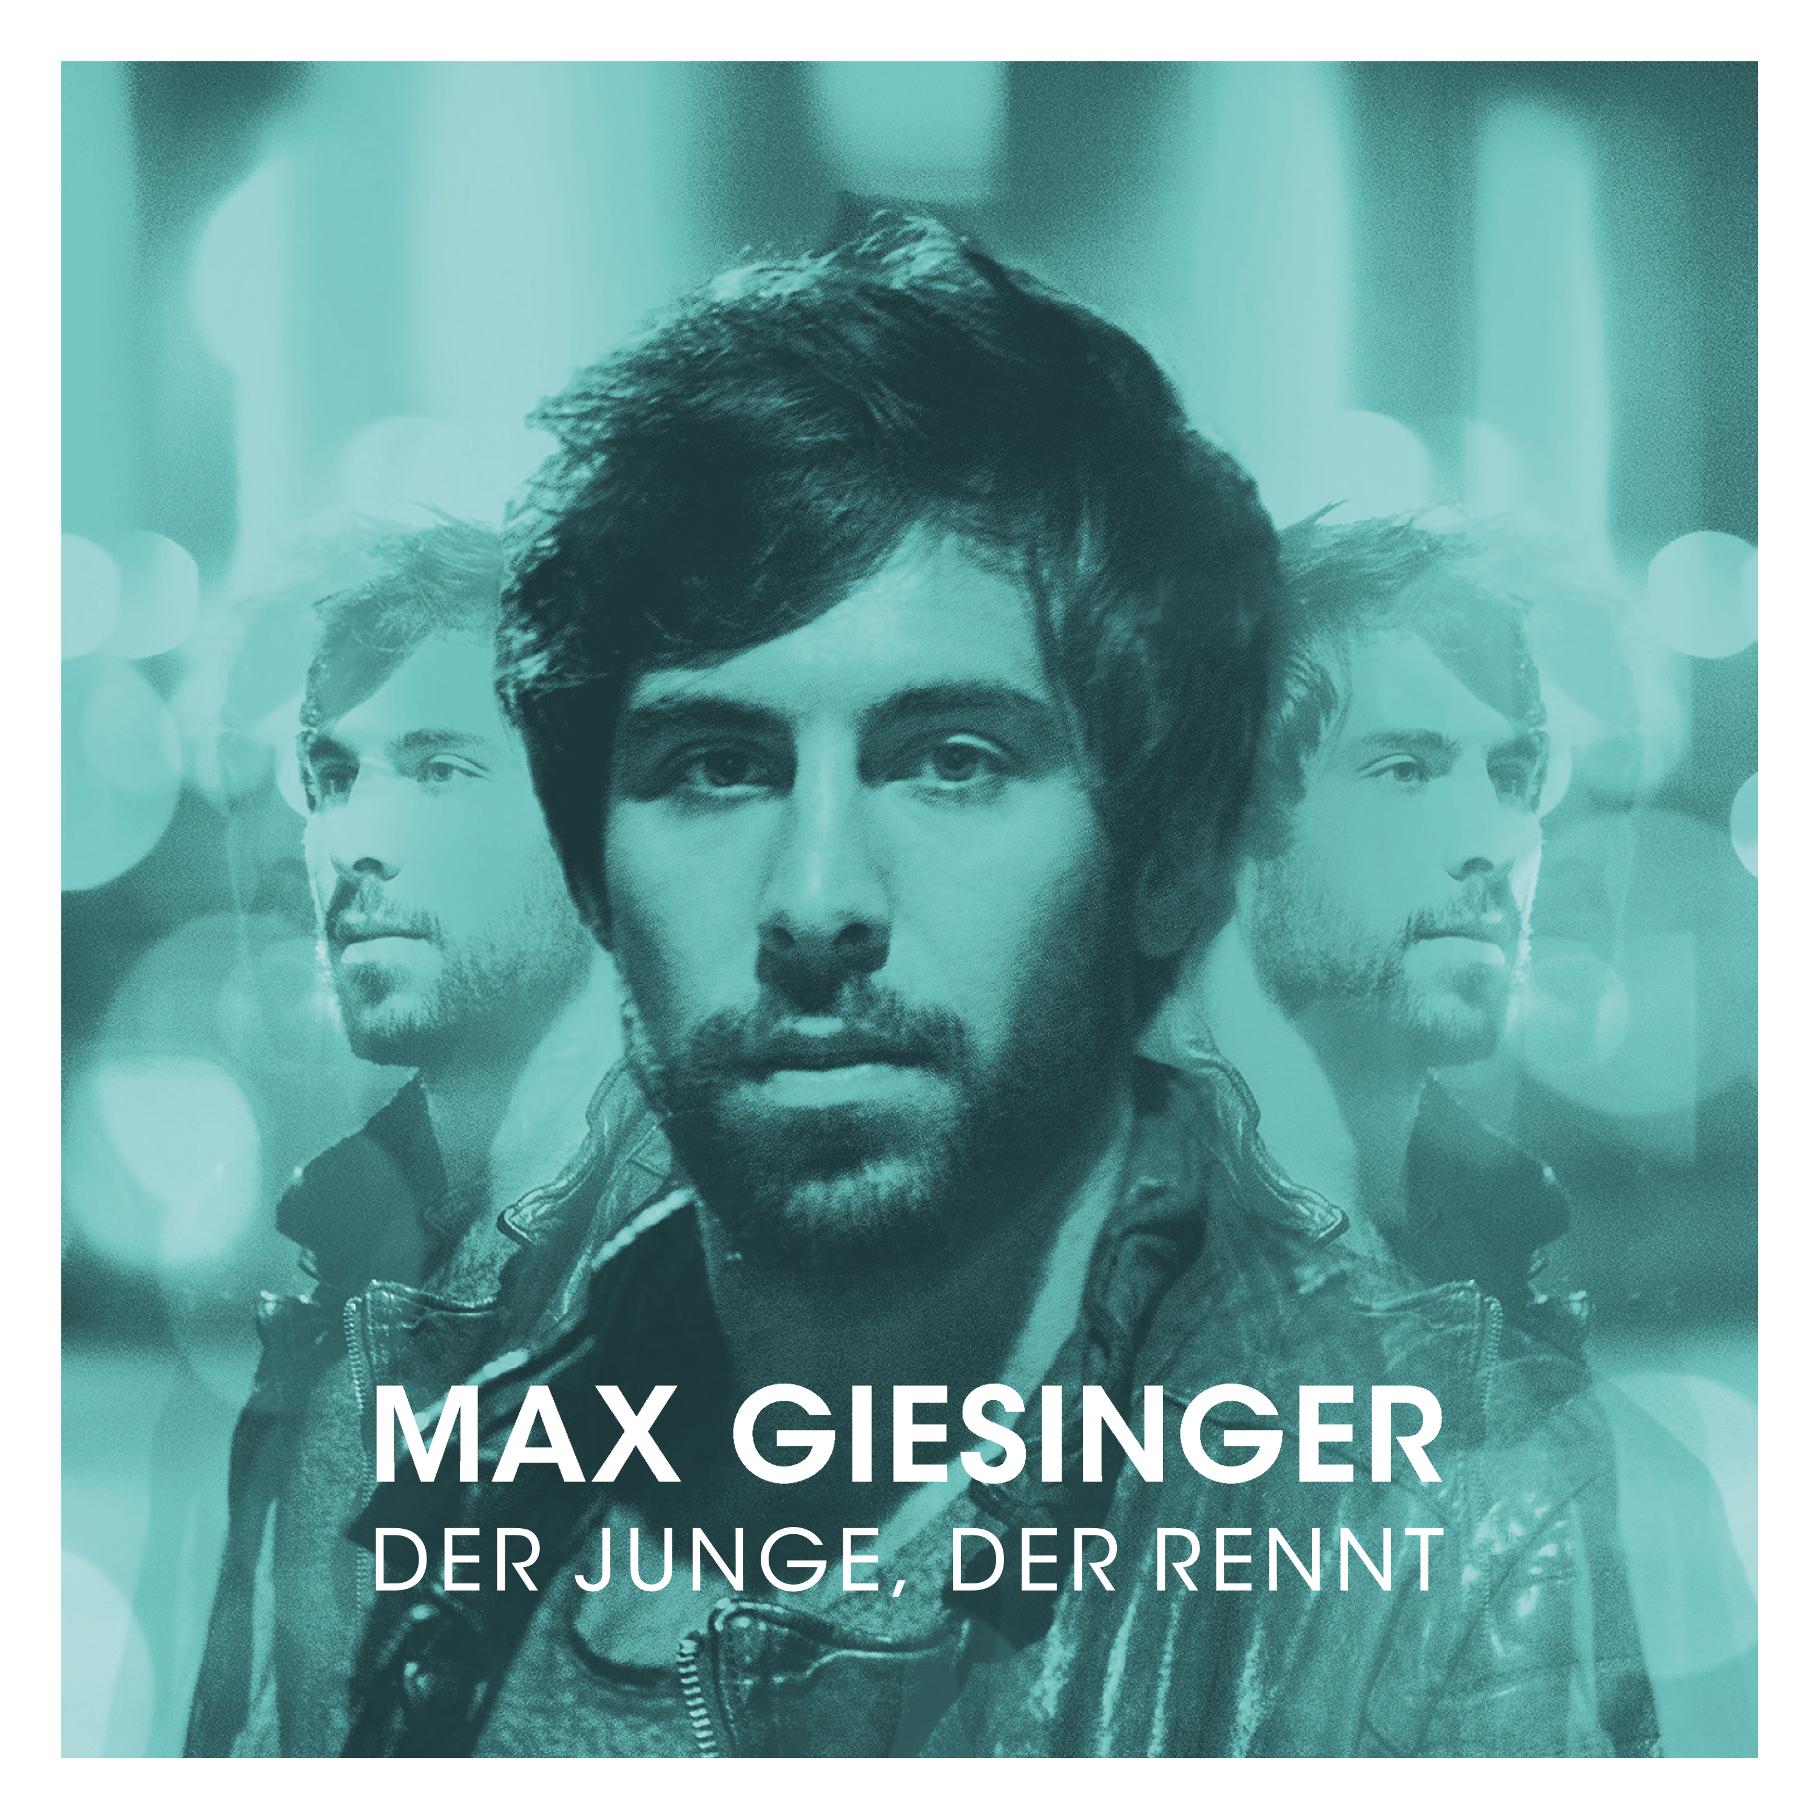 SCHiCK MAGAZIN » Max Giesinger Album Cover - SCHiCK MAGAZIN